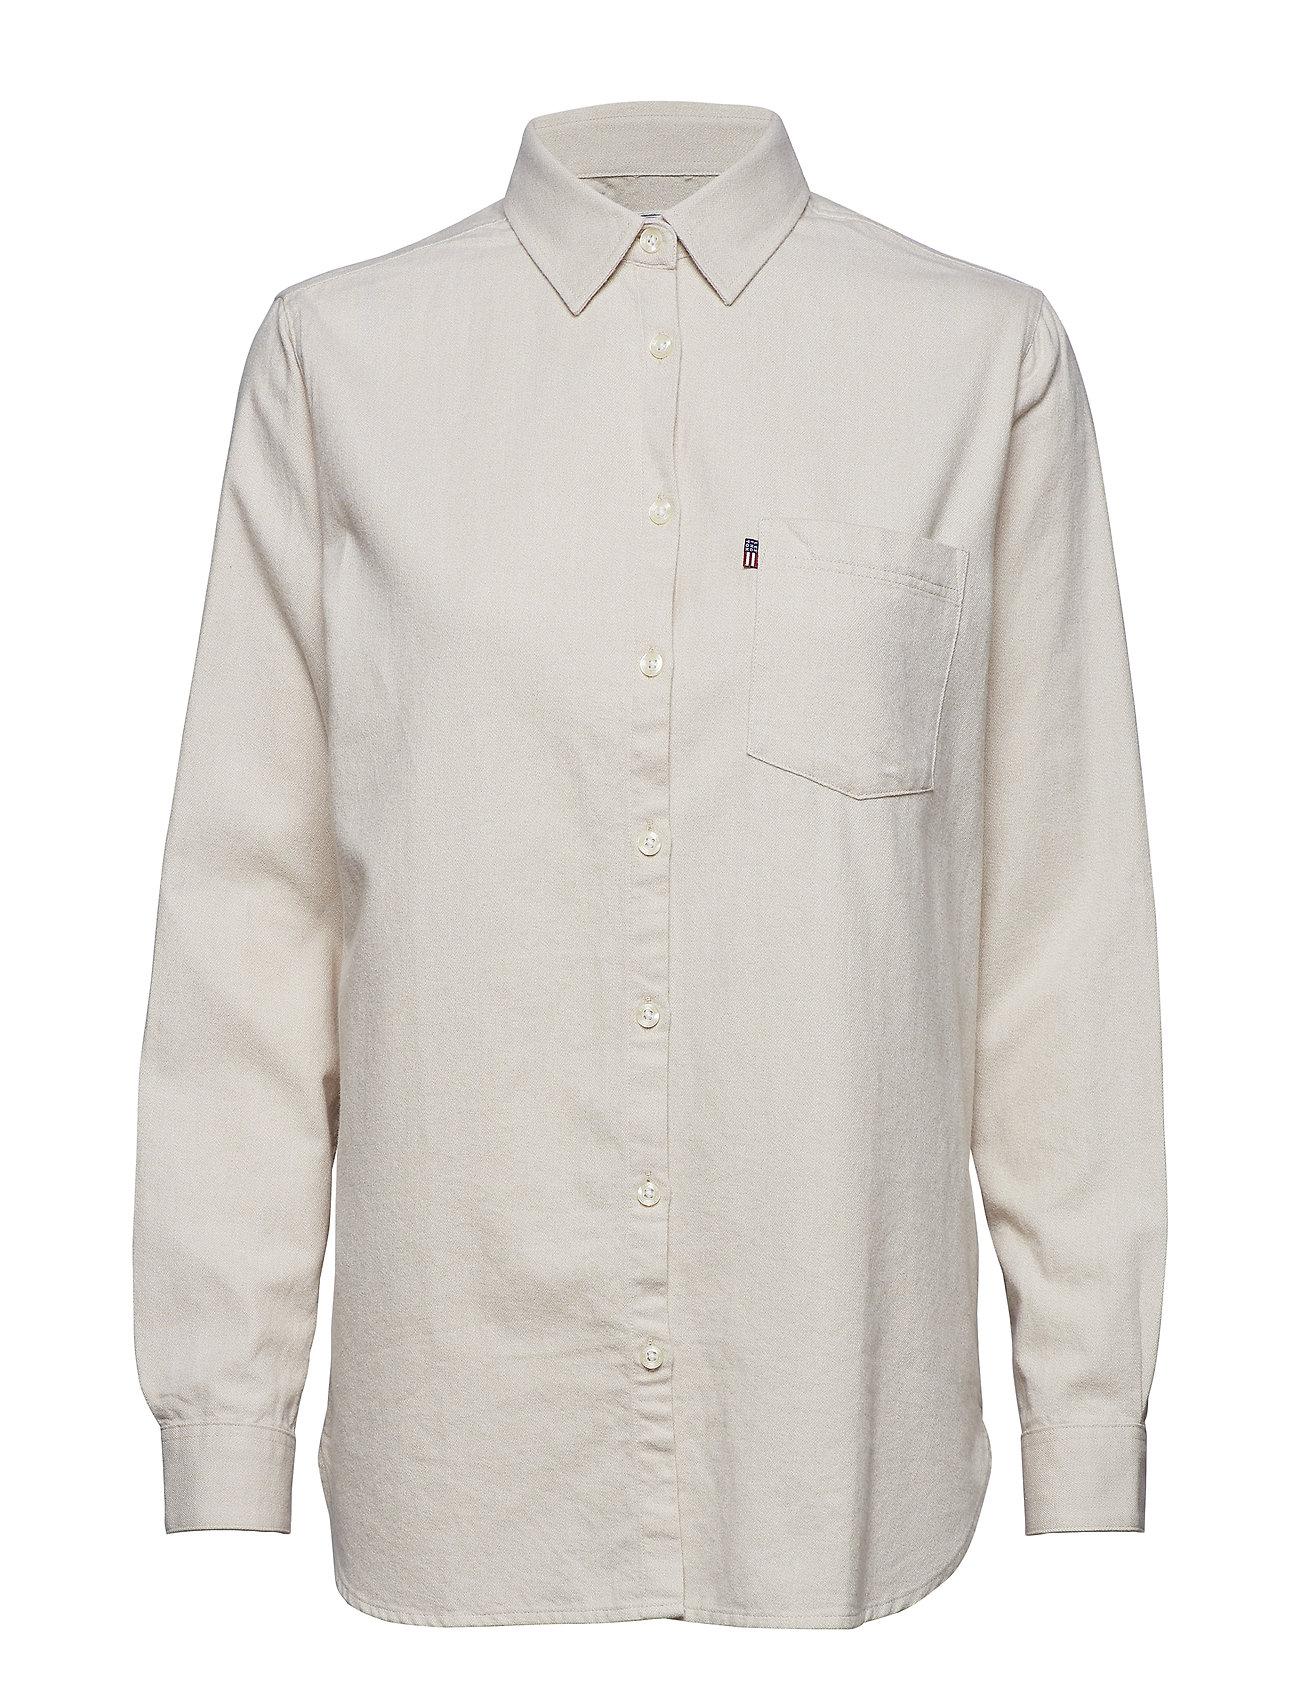 Lexington Clothing Isa Flannel Shirt - BEIGE MELANGE